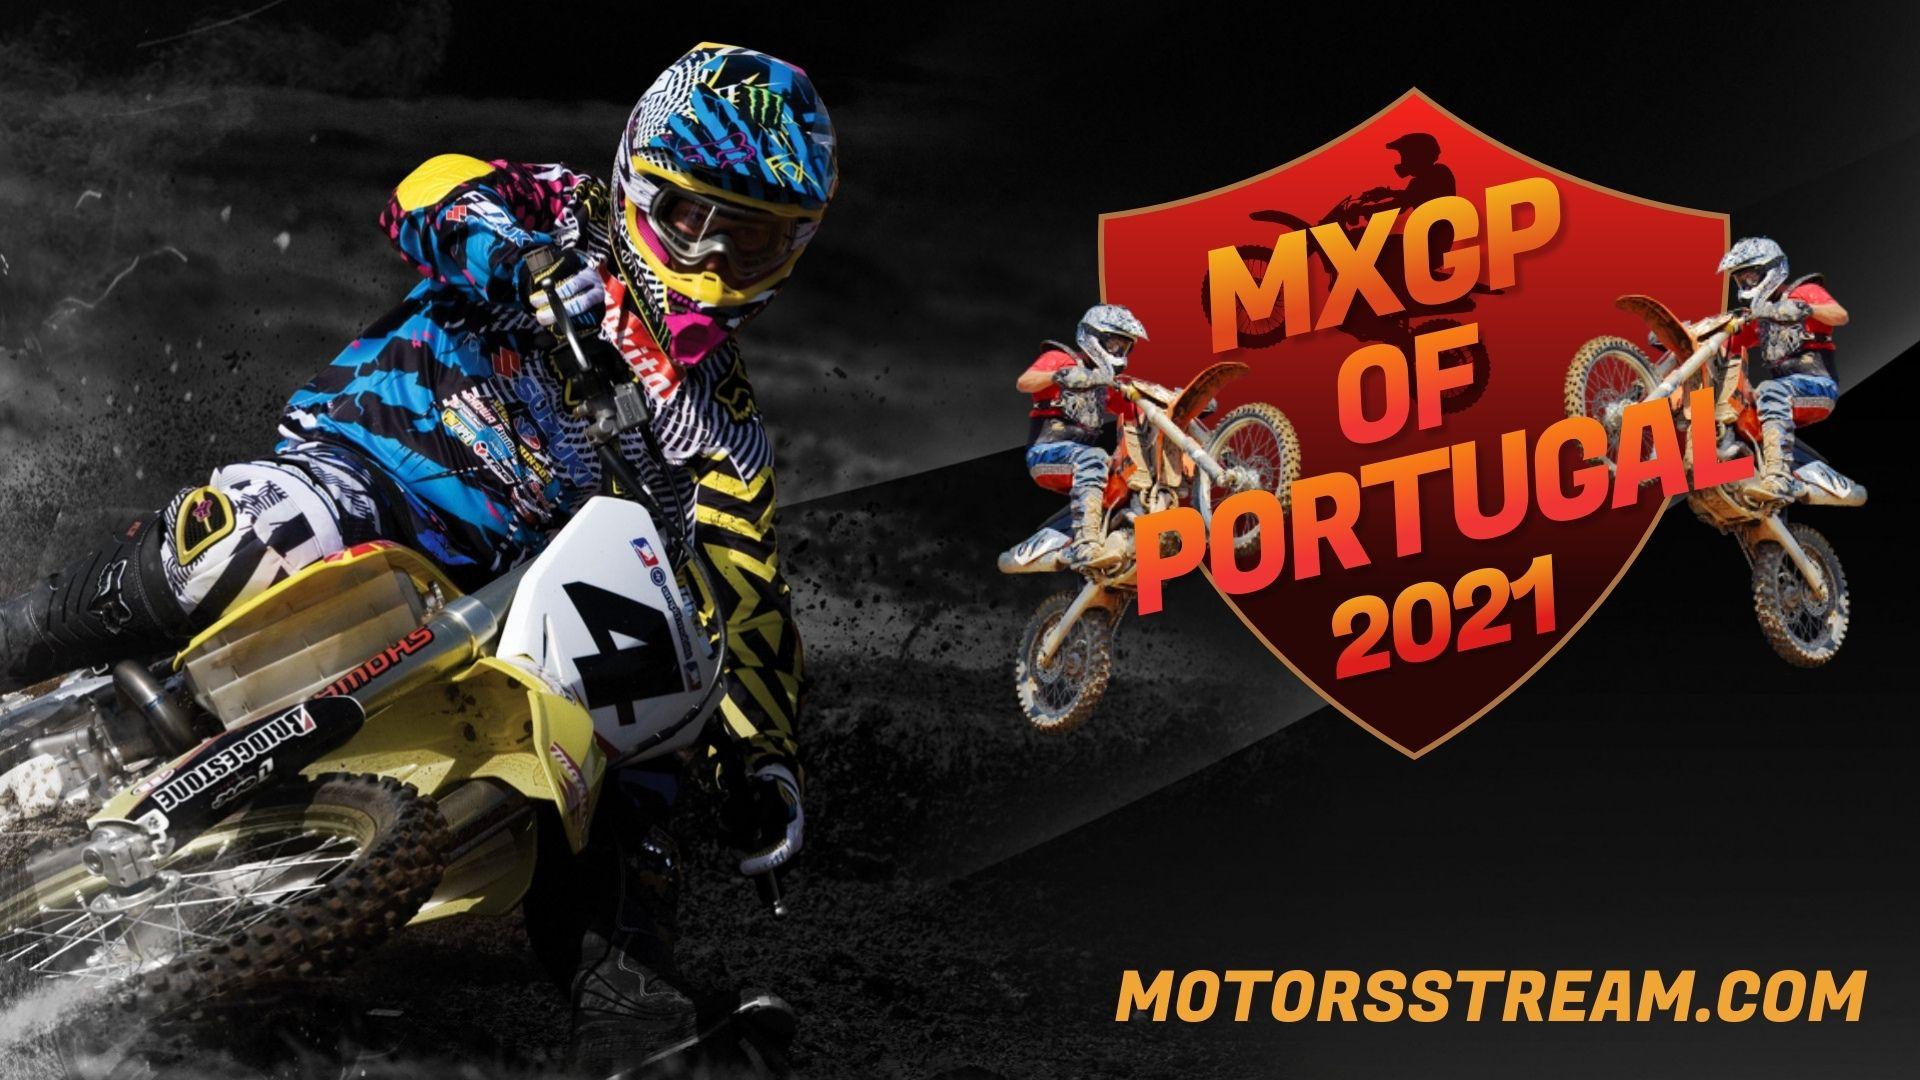 FIM Motocross WC Portugal Live Stream 2021 | MXGP